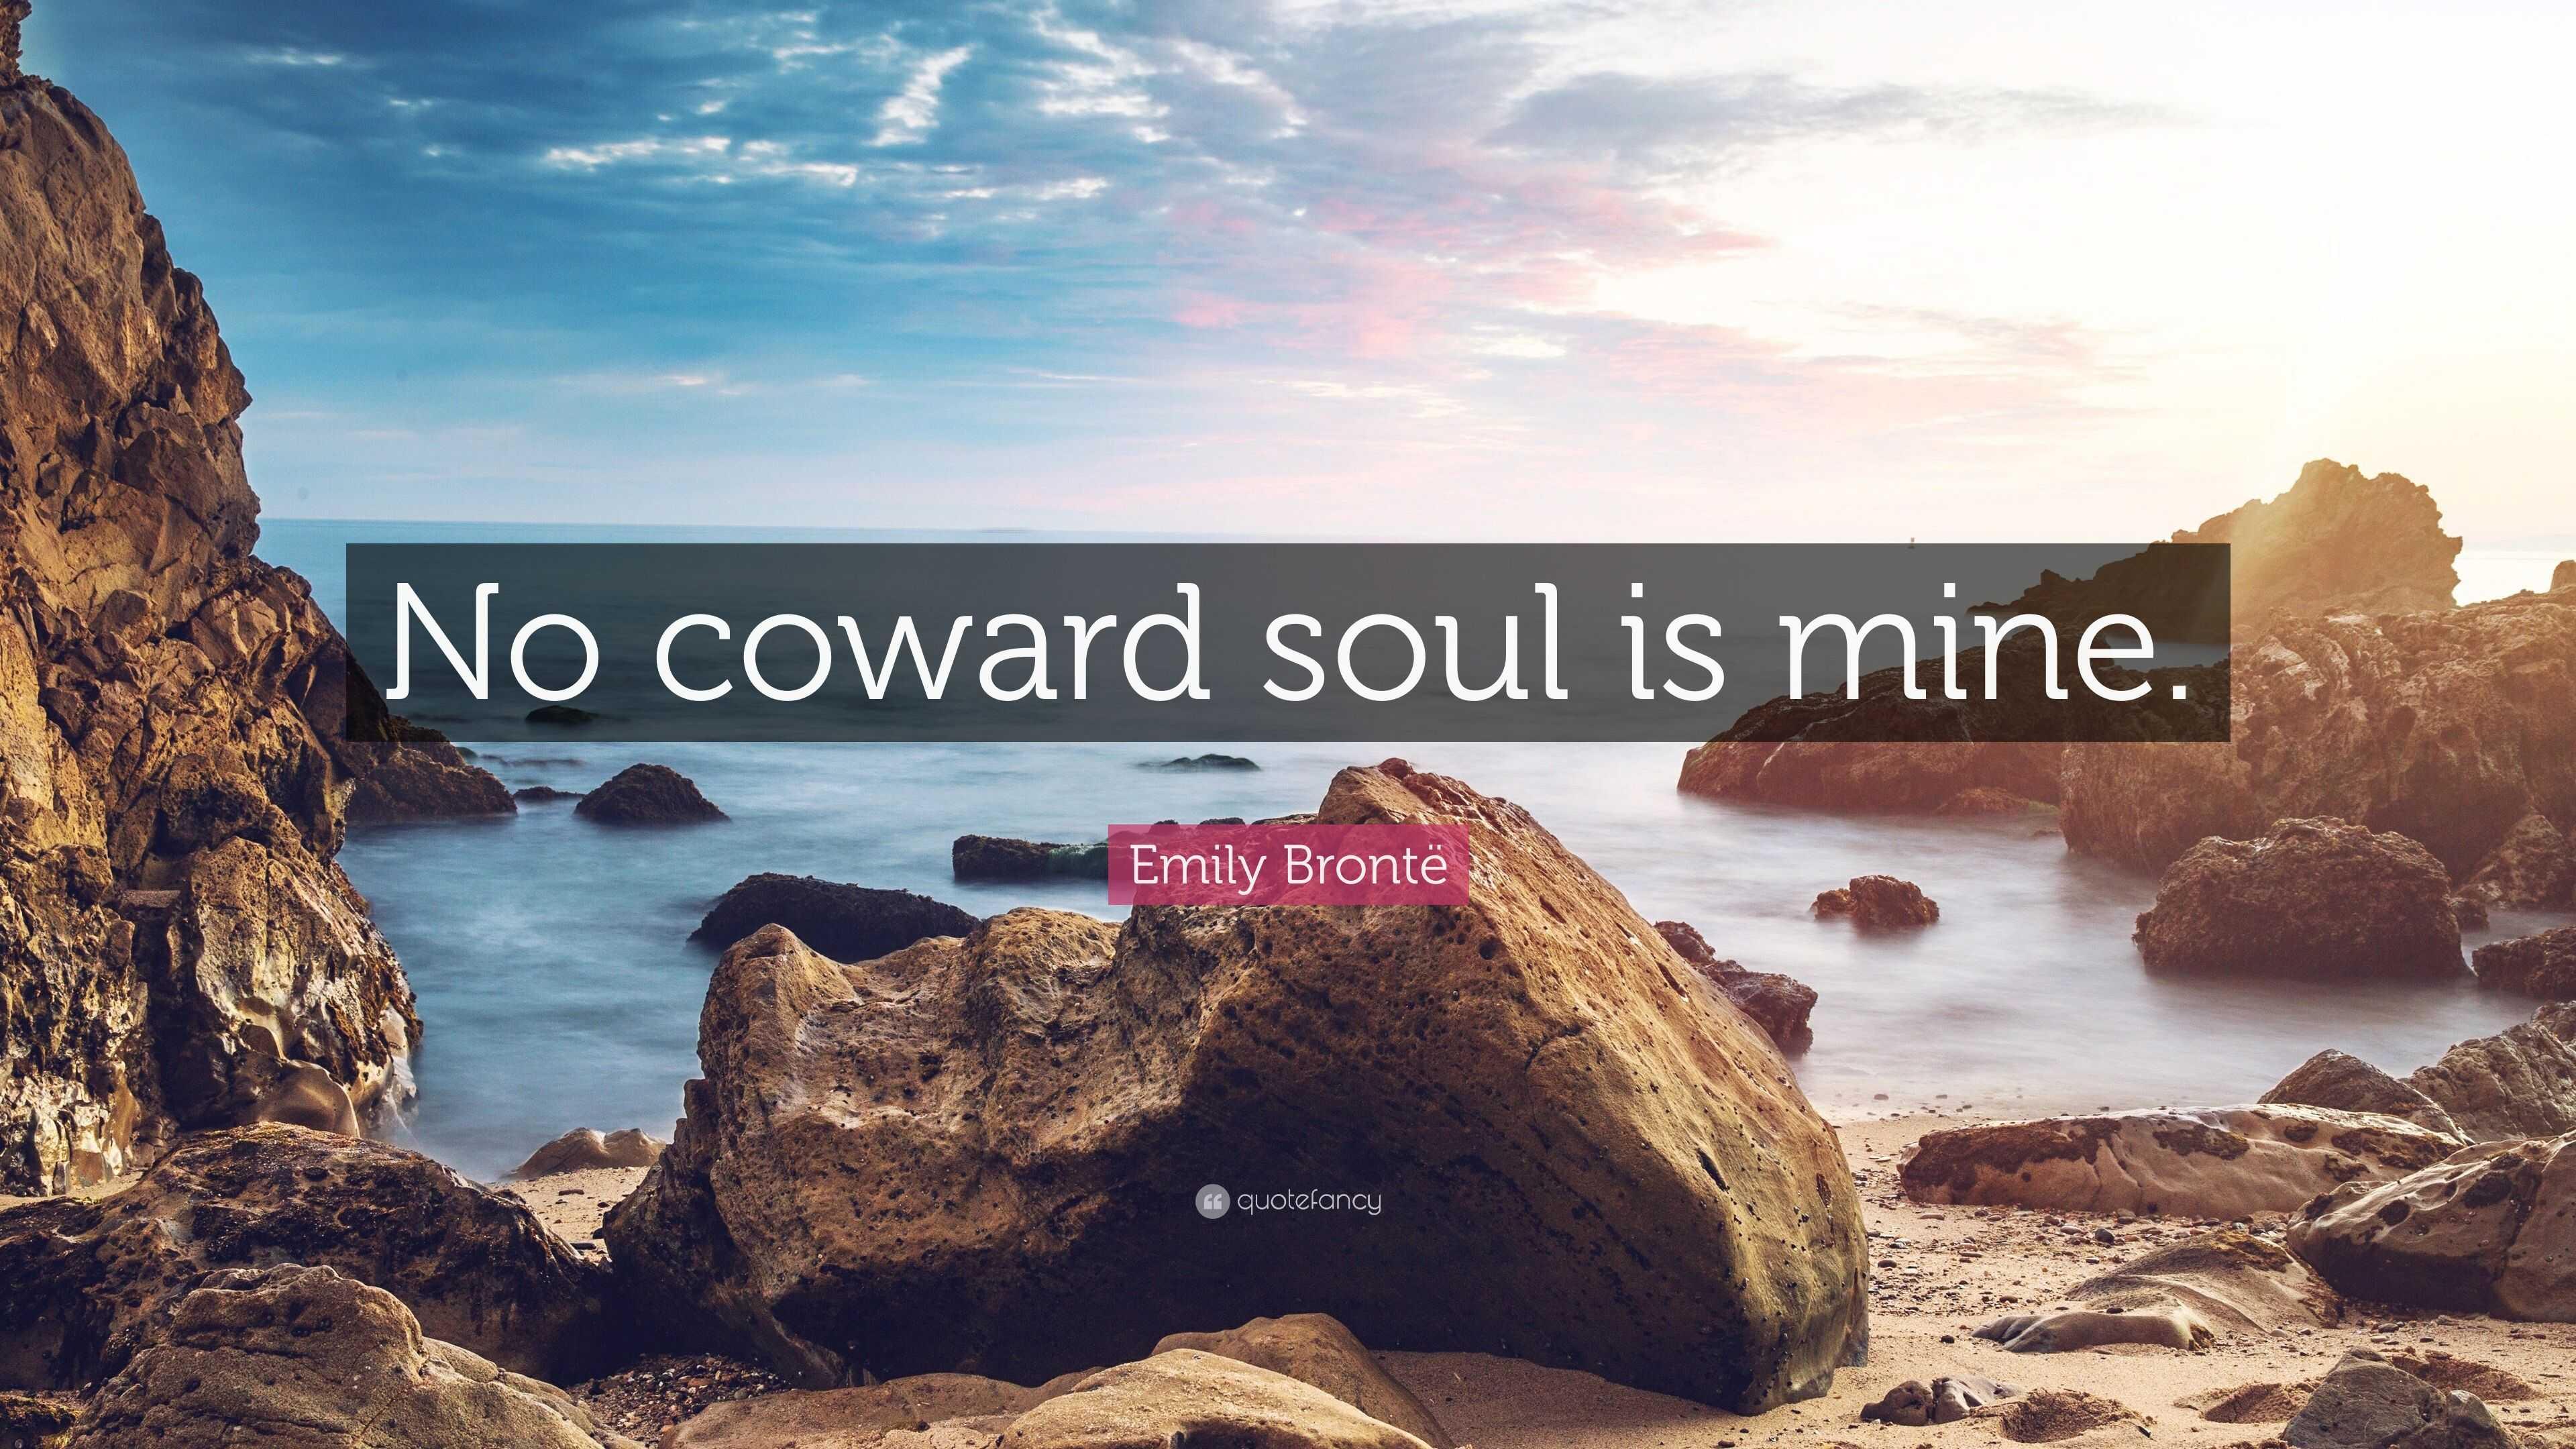 emily bronte no coward soul is mine